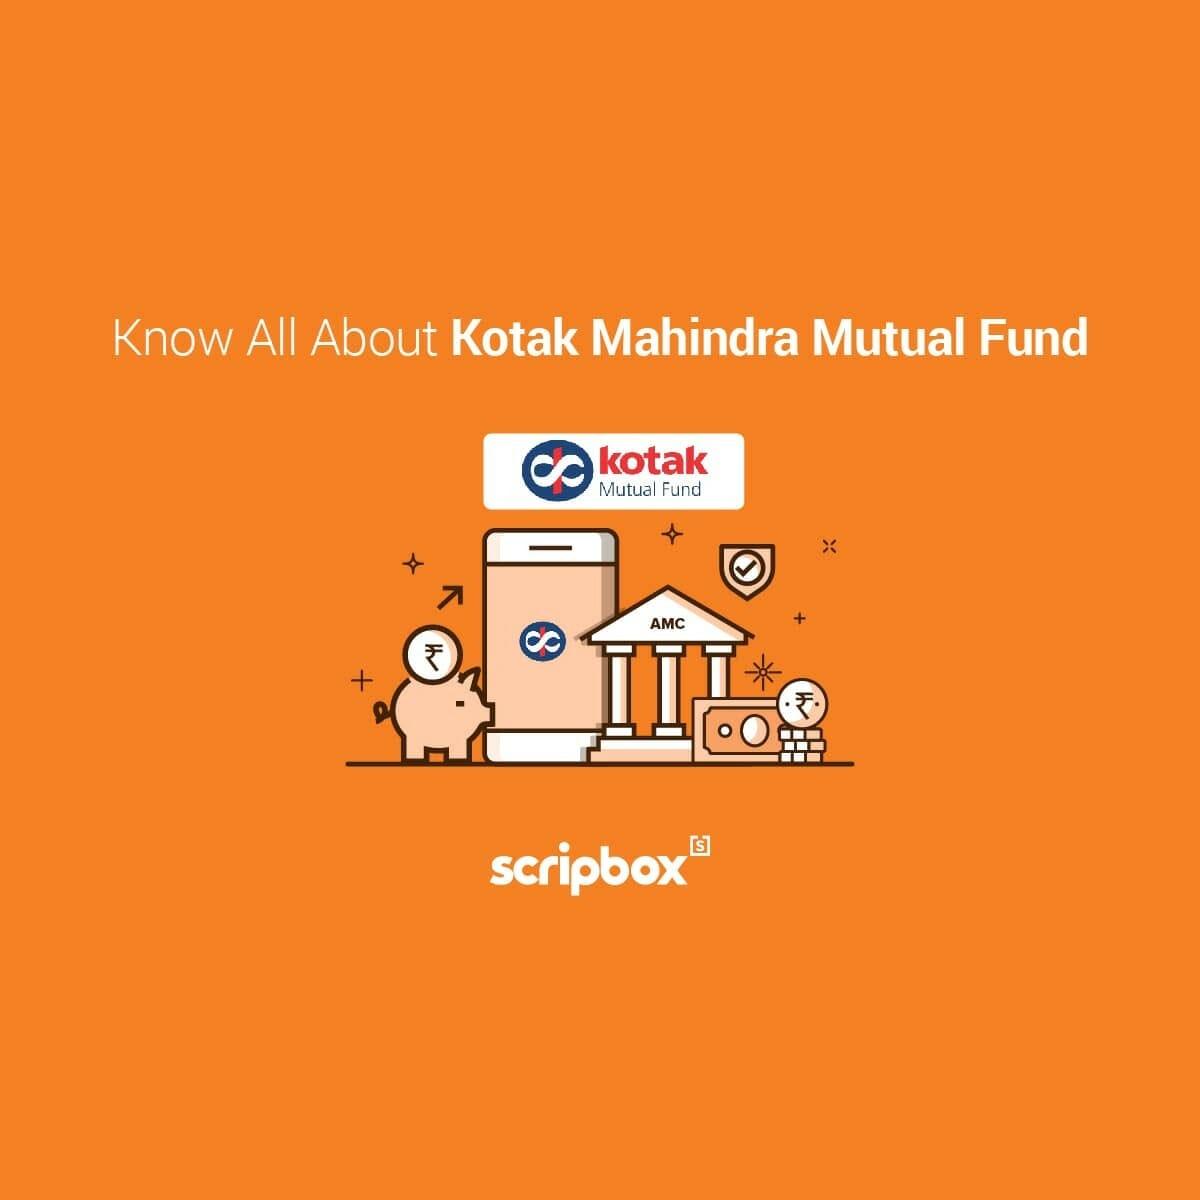 kotak mahindra mutual fund